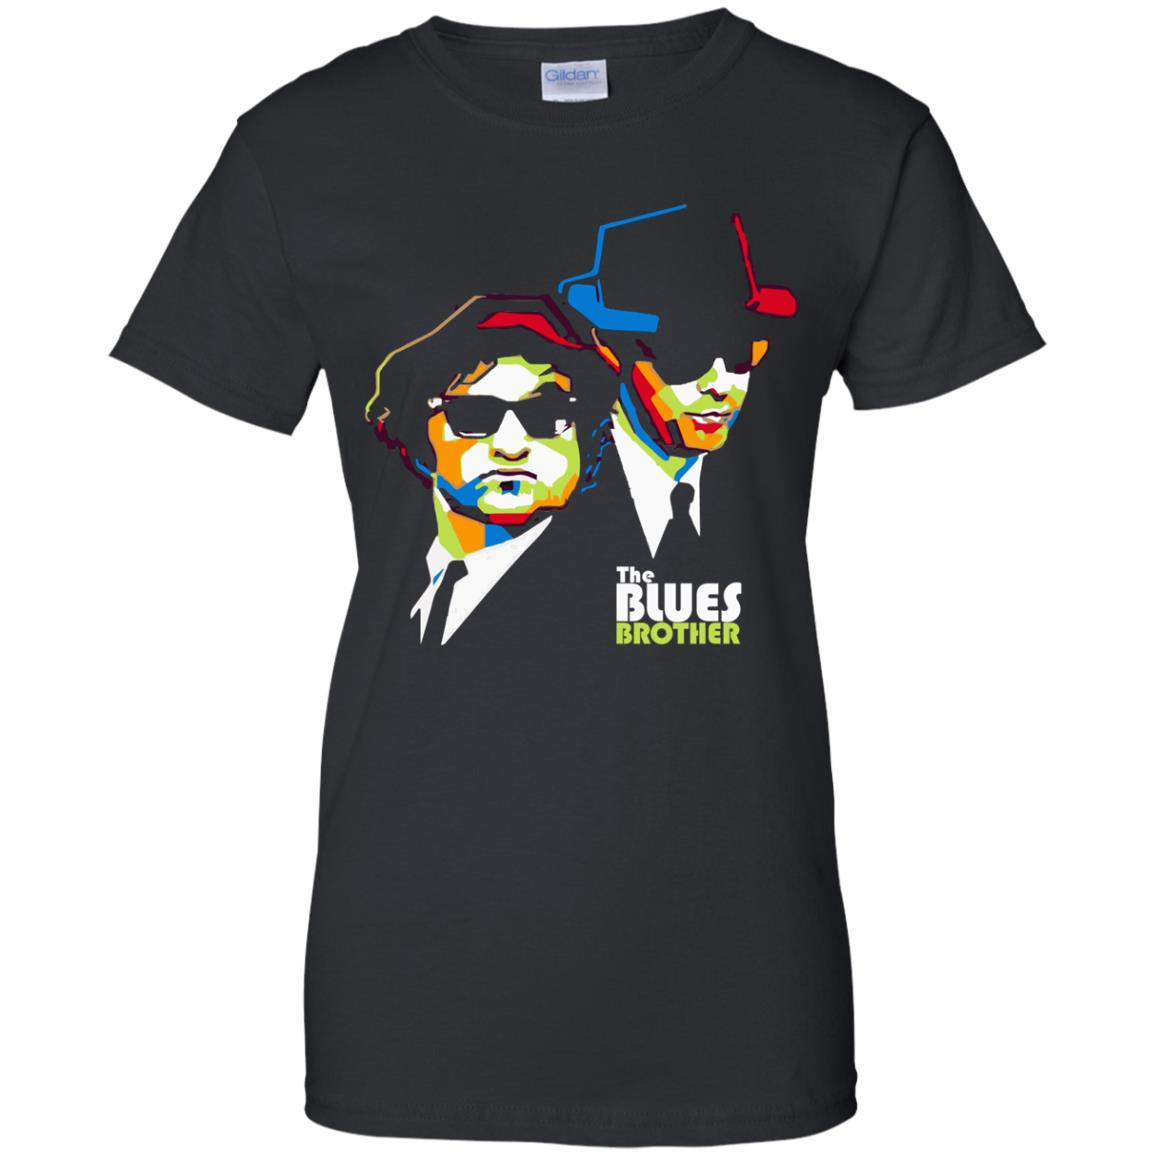 image 649 - The Blues Brother Shirt, Sweatshirt, Hoodie